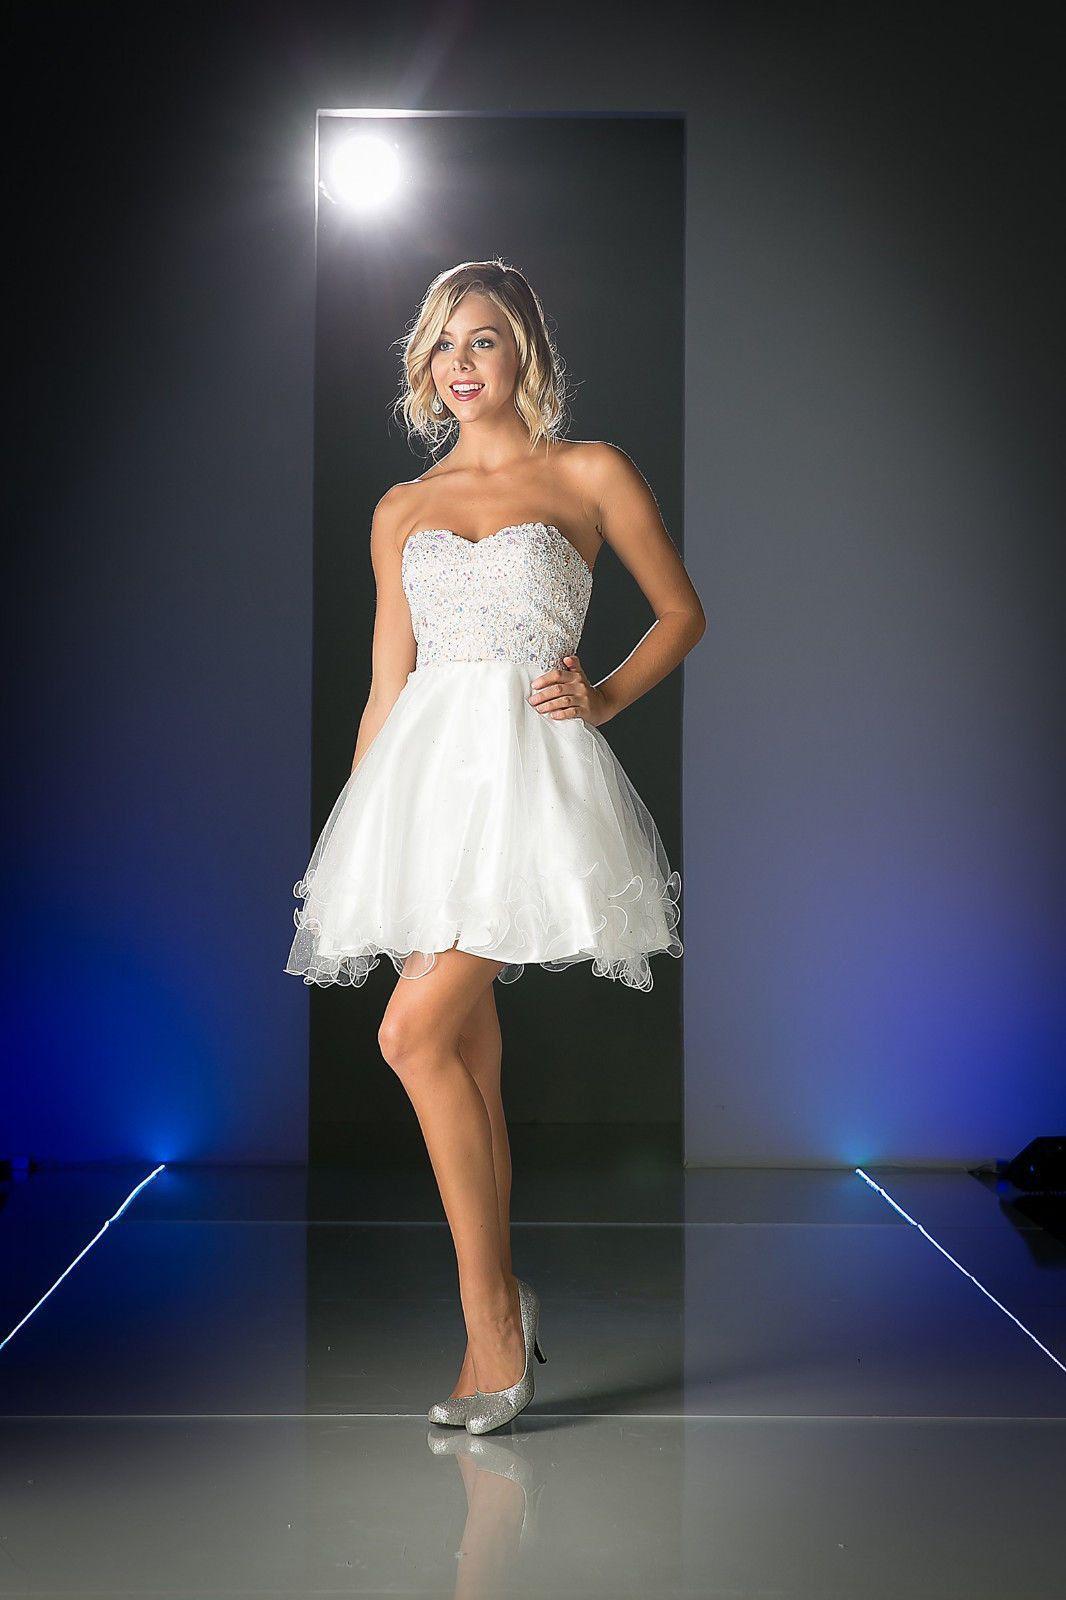 Short sexy homecoming prom dress formal cocktail fun flirty shorts